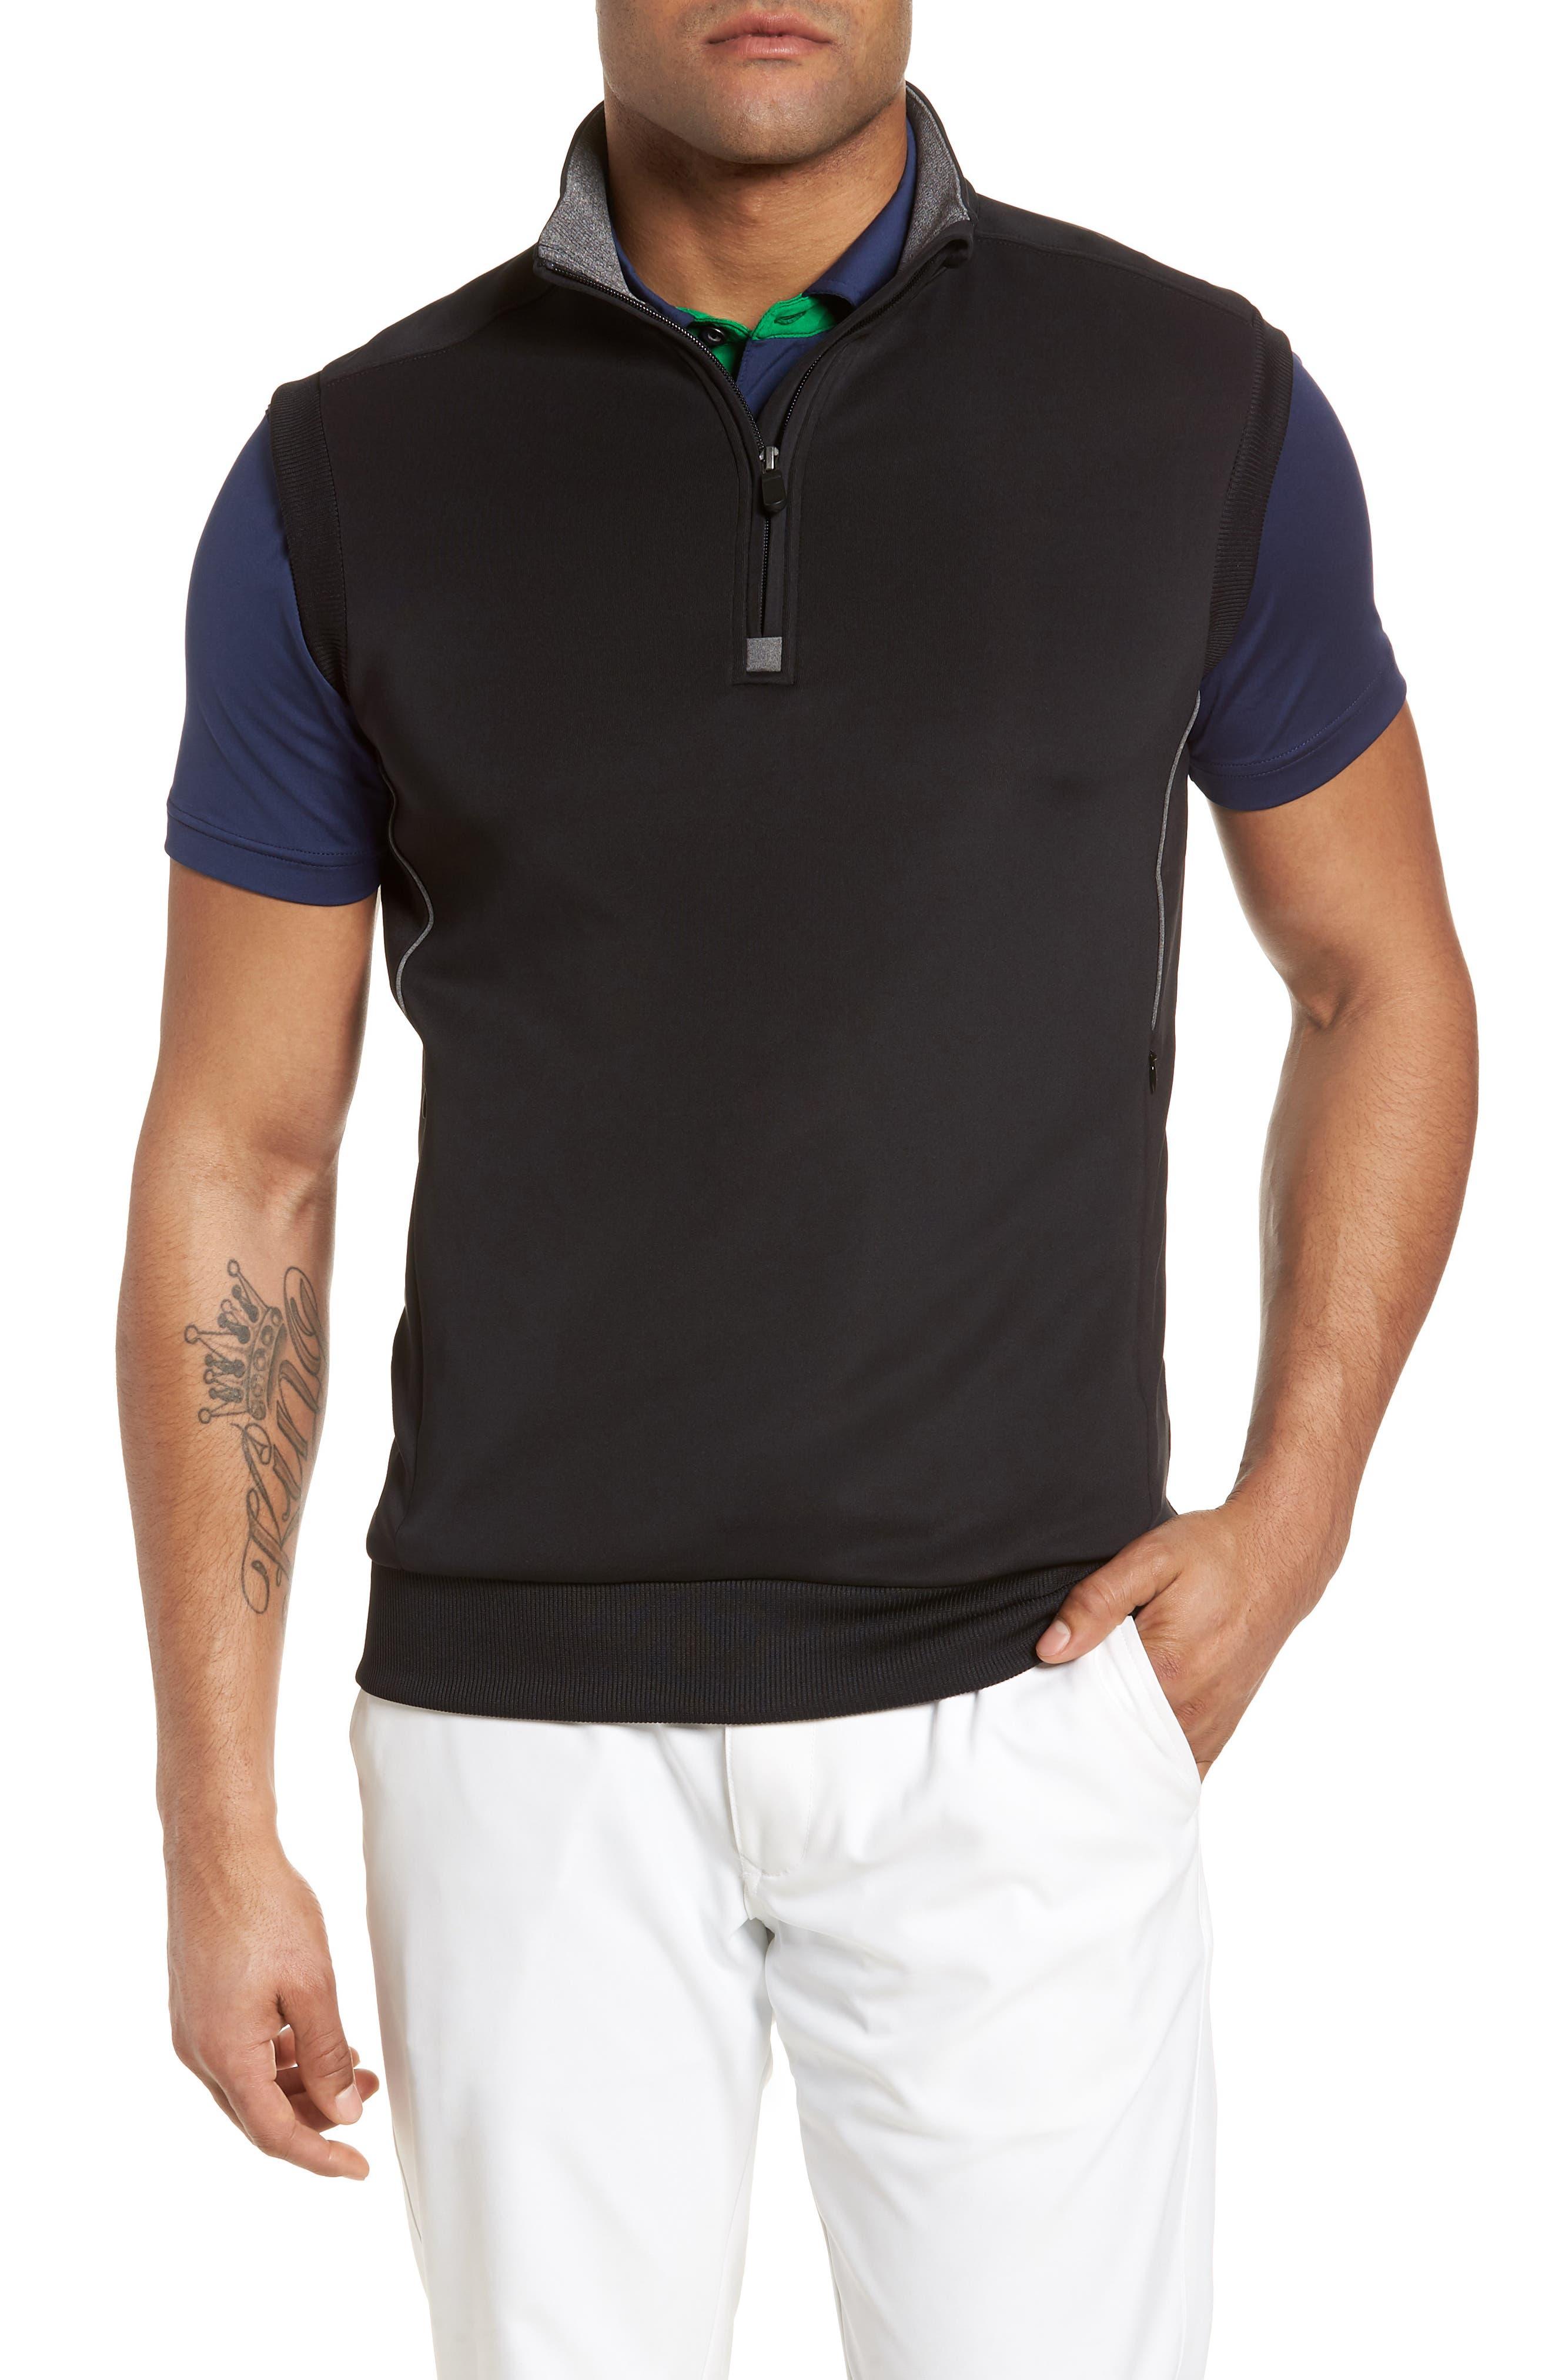 Bobby Jones Quarter Zip Tech Vest, Black